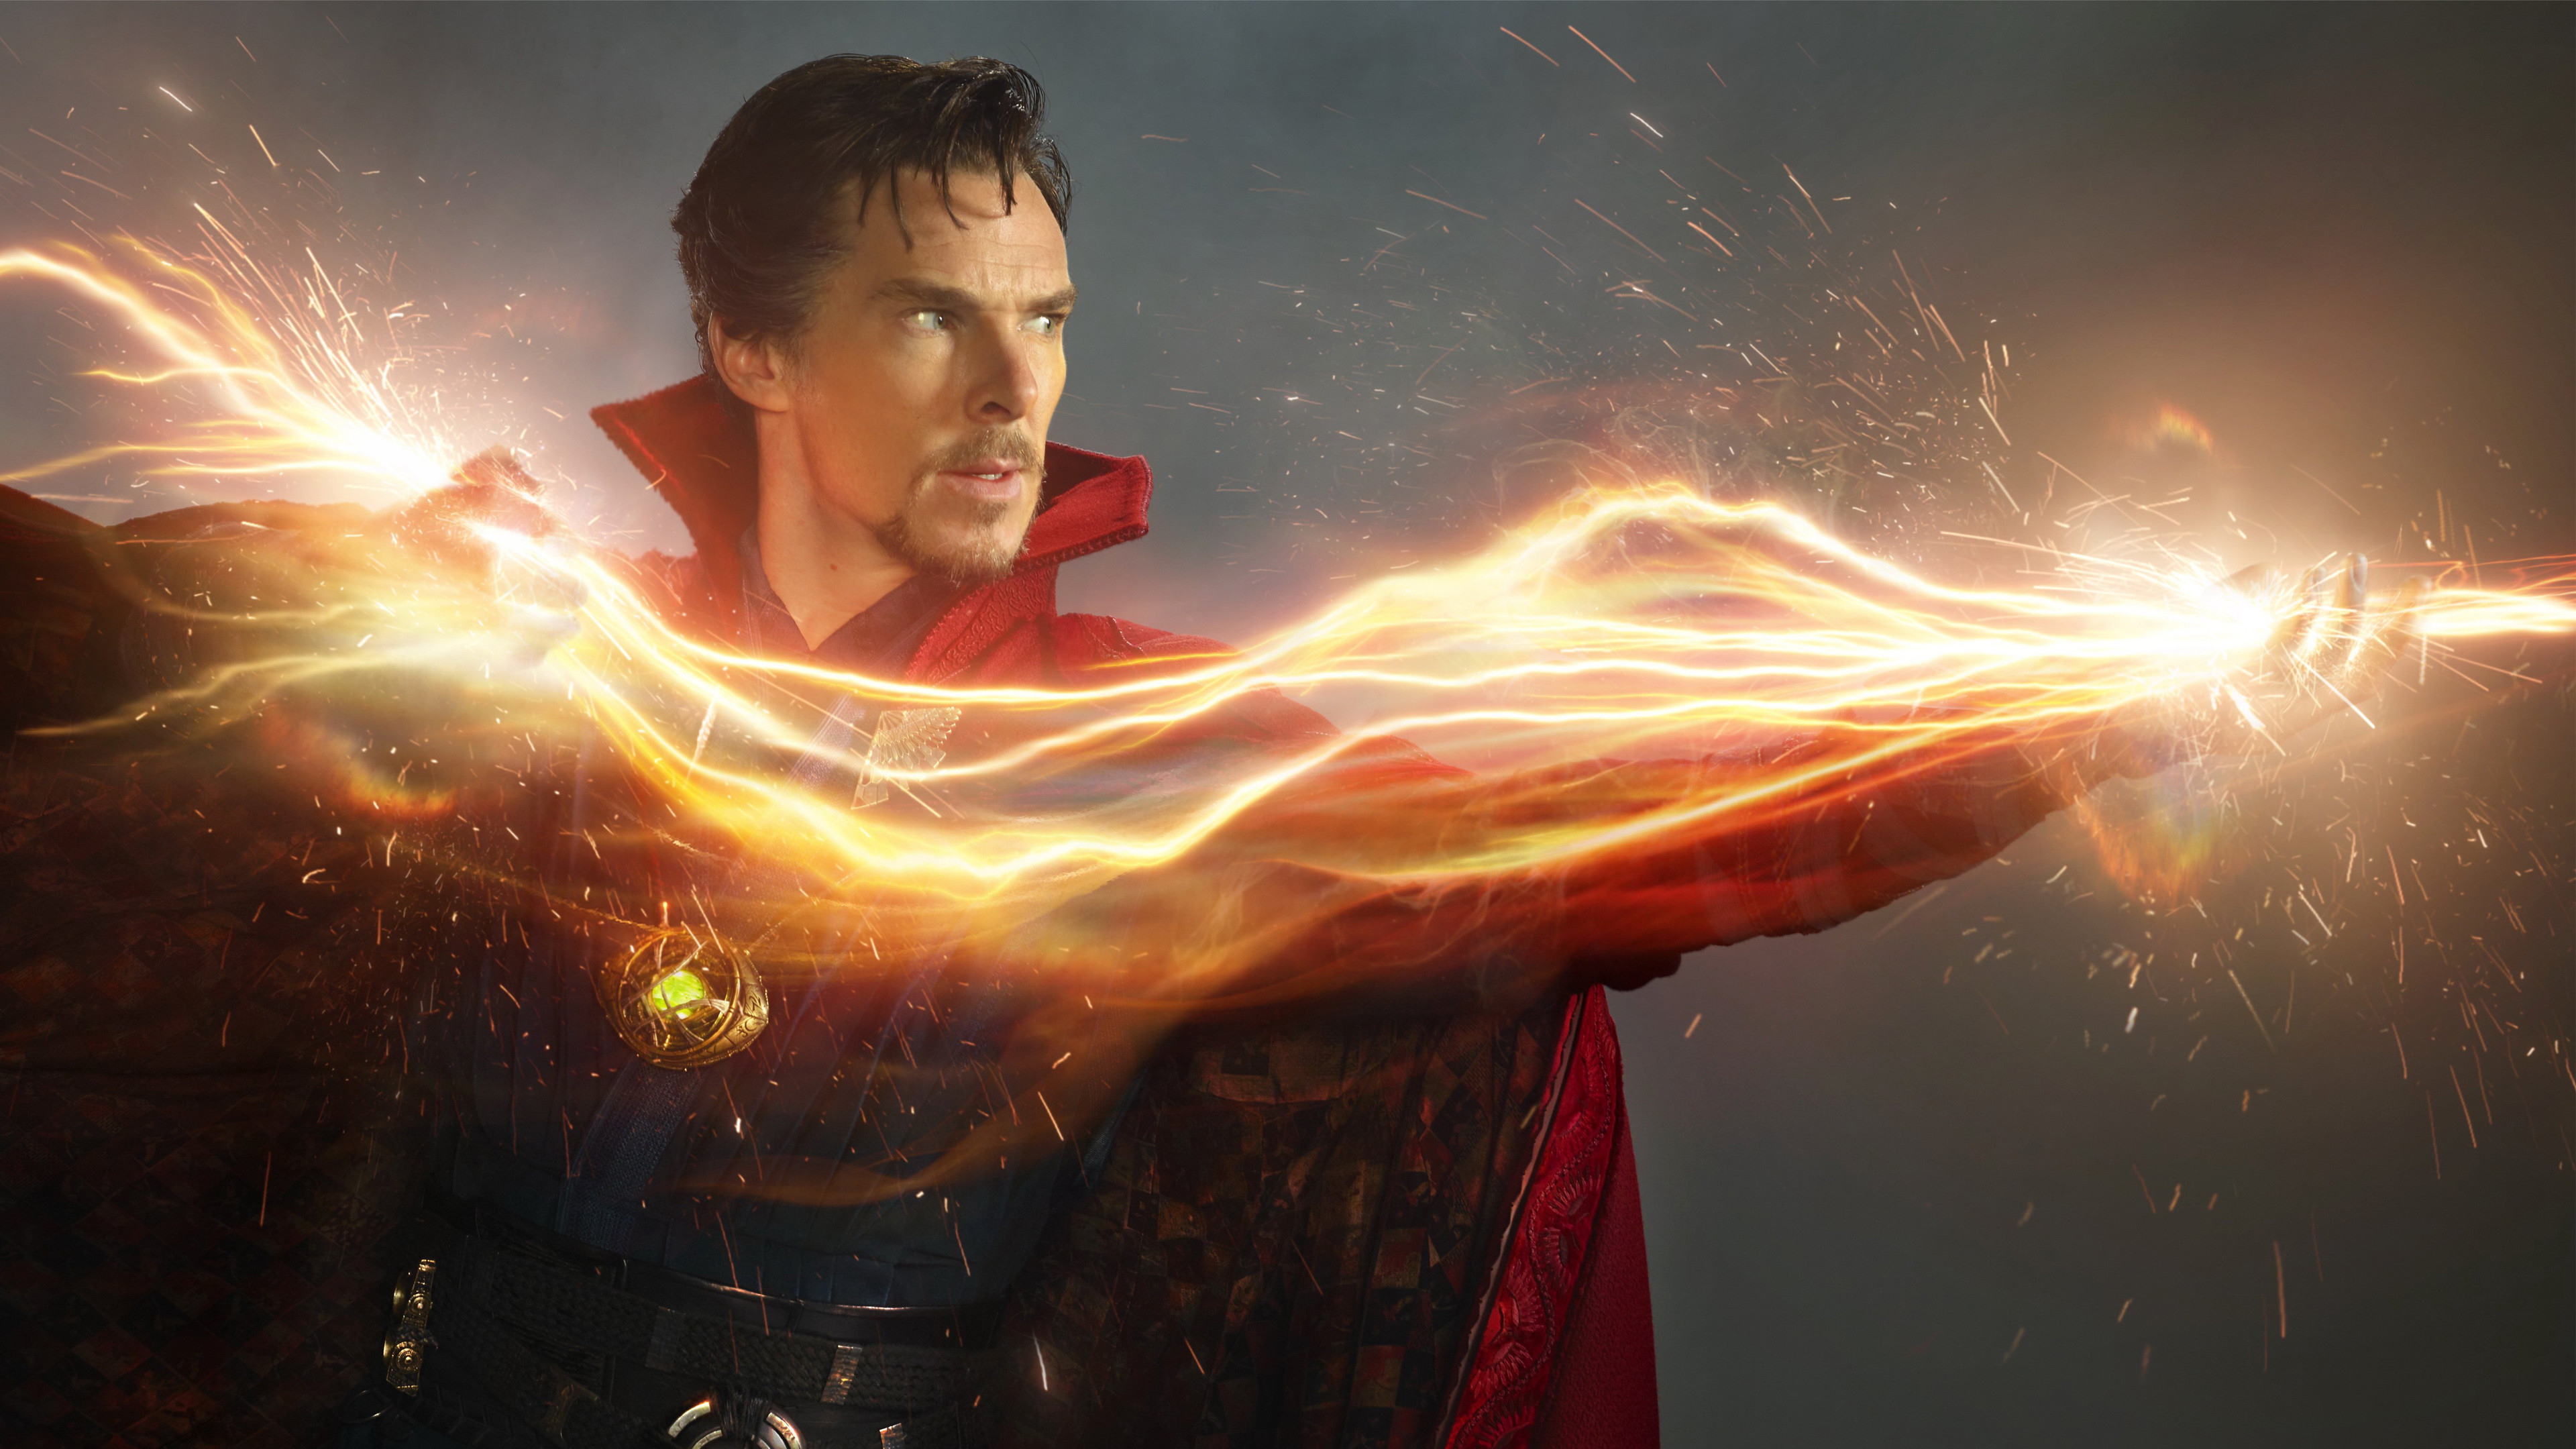 Doctor Strange Benedict Cumberbatch Wallpapers   HD Wallpapers